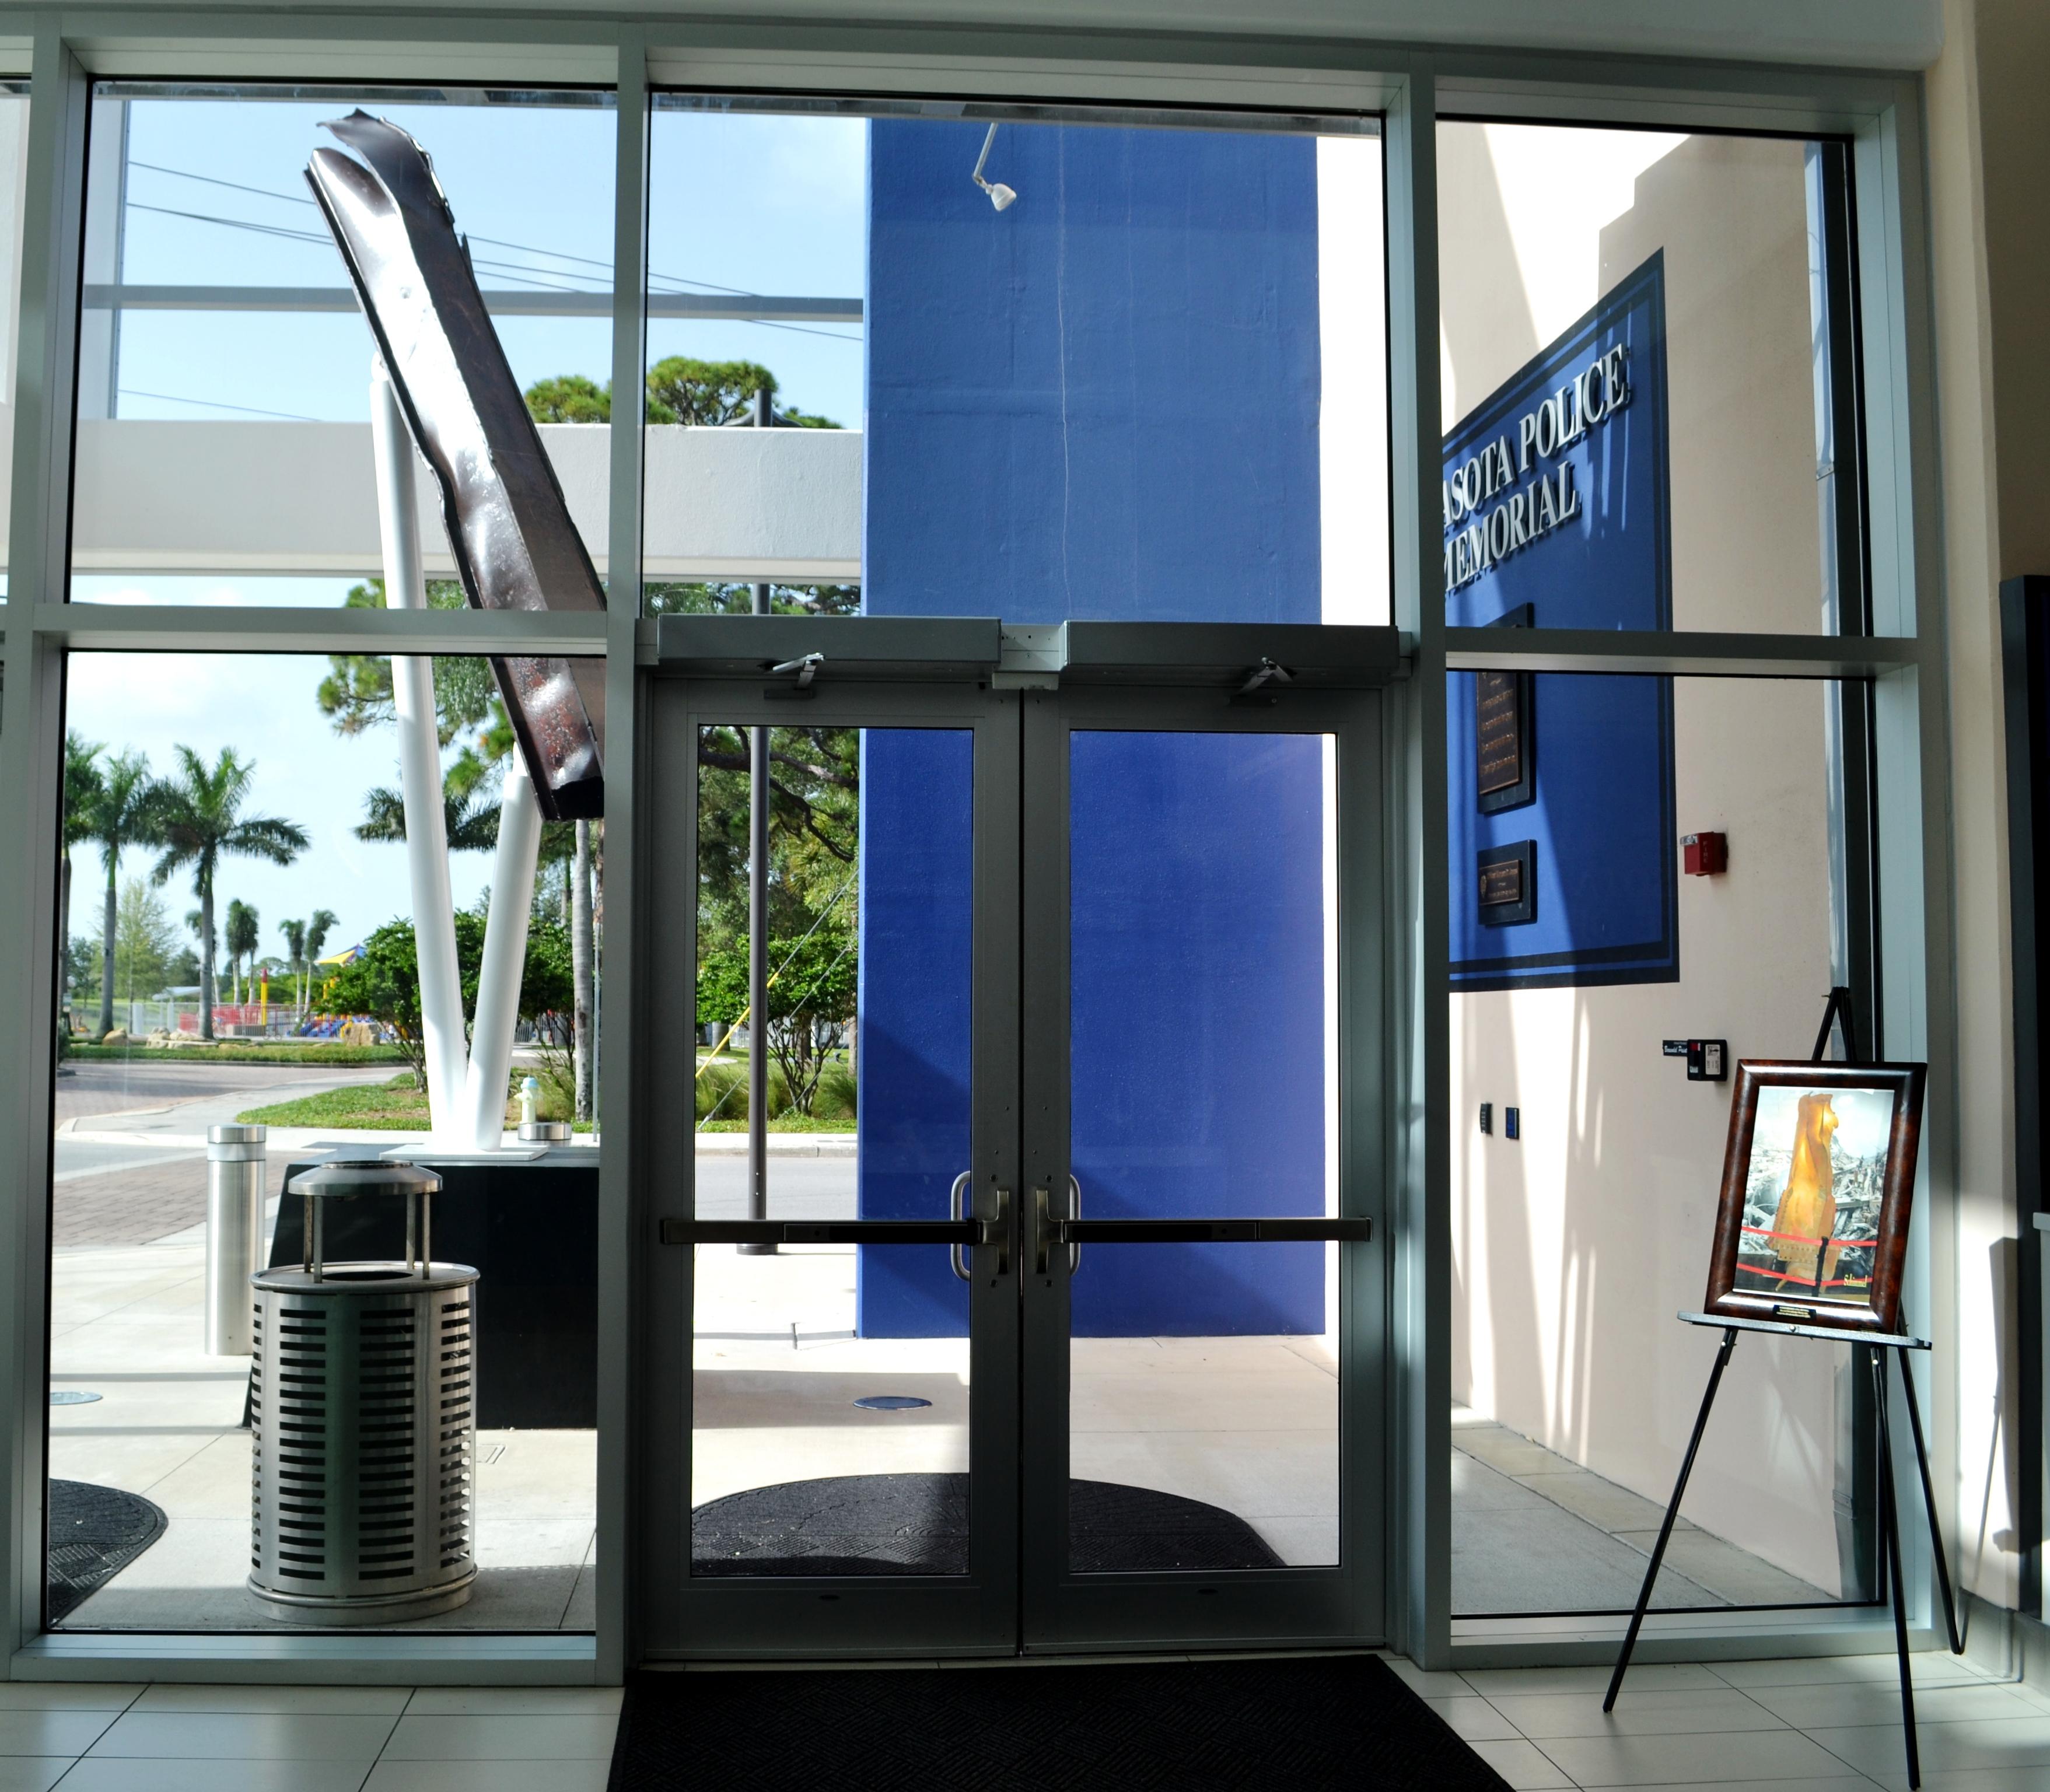 Sarasota PD looking through front door July 2012